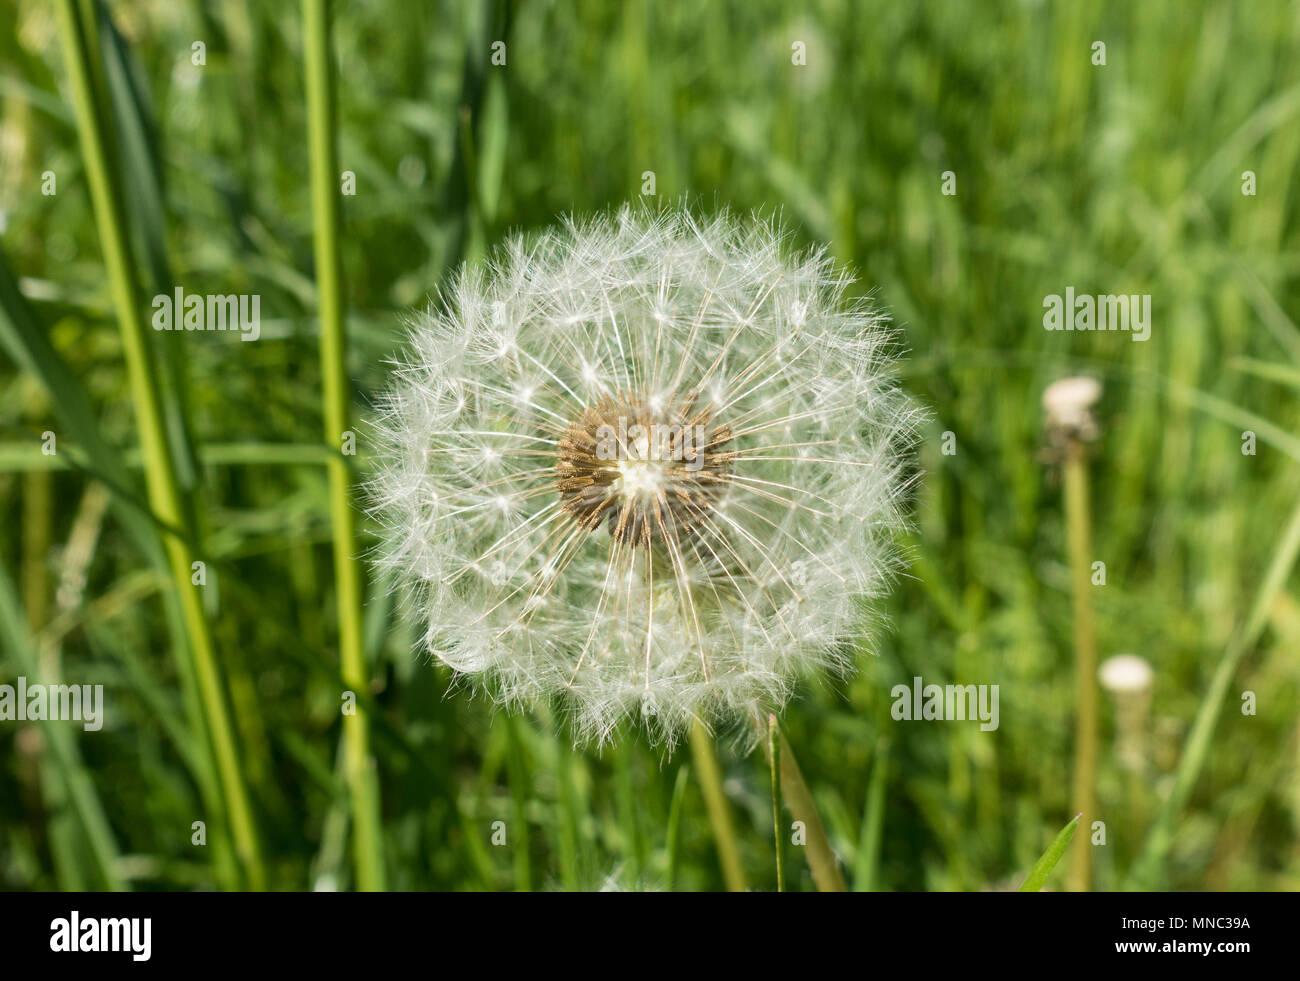 dandelion-seed-head-MNC39A.jpg